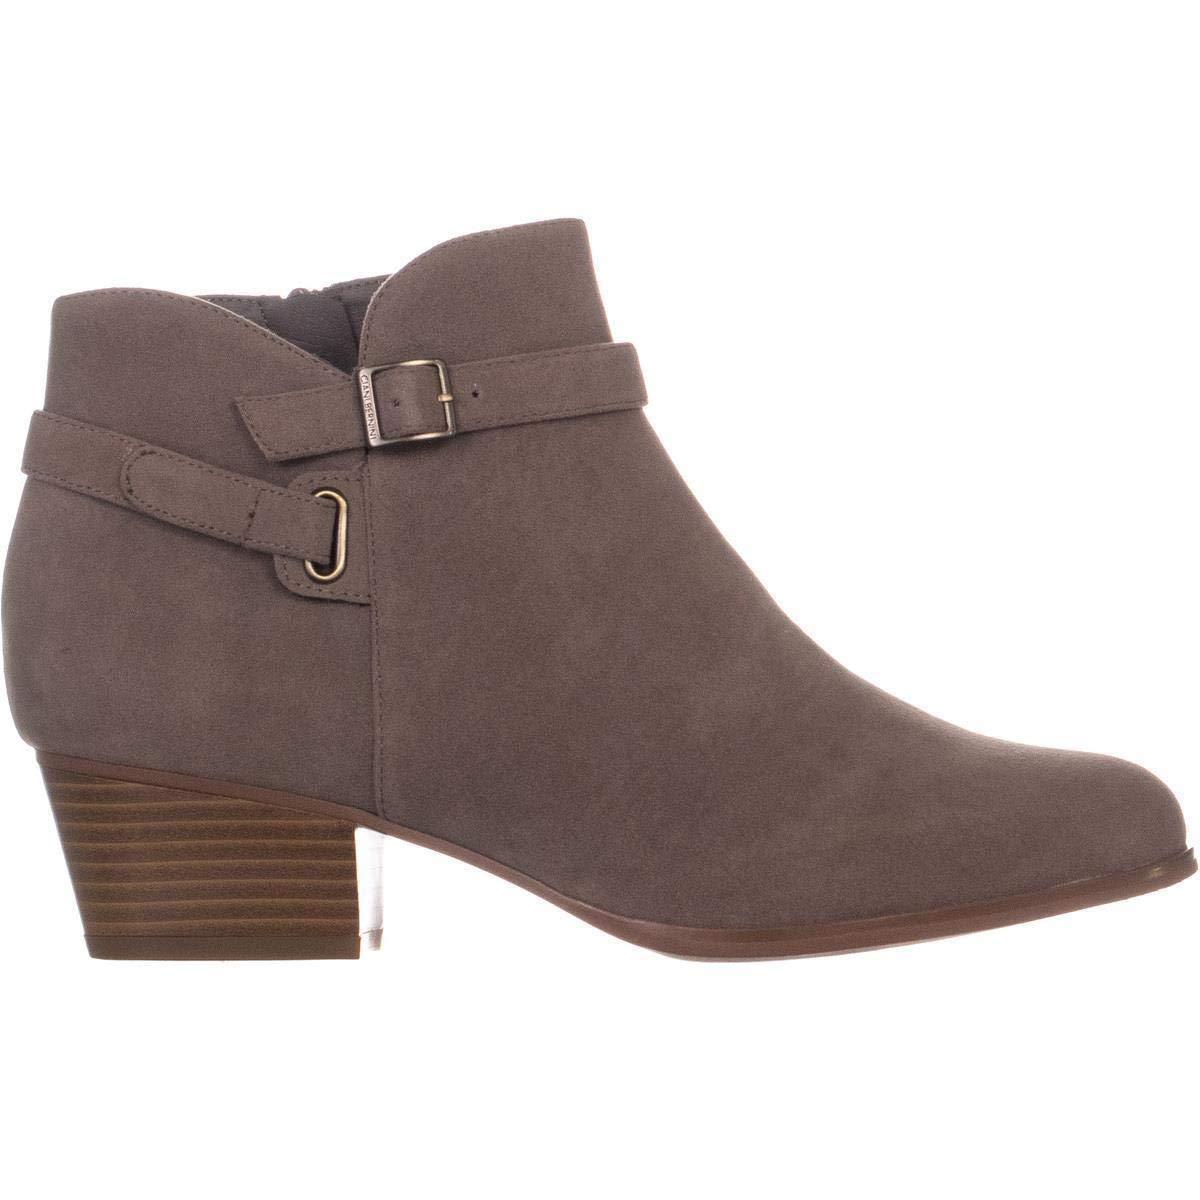 thumbnail 16 - Giani-Bernini-Womens-Dorii-Leather-Almond-Toe-Ankle-Fashion-Boots